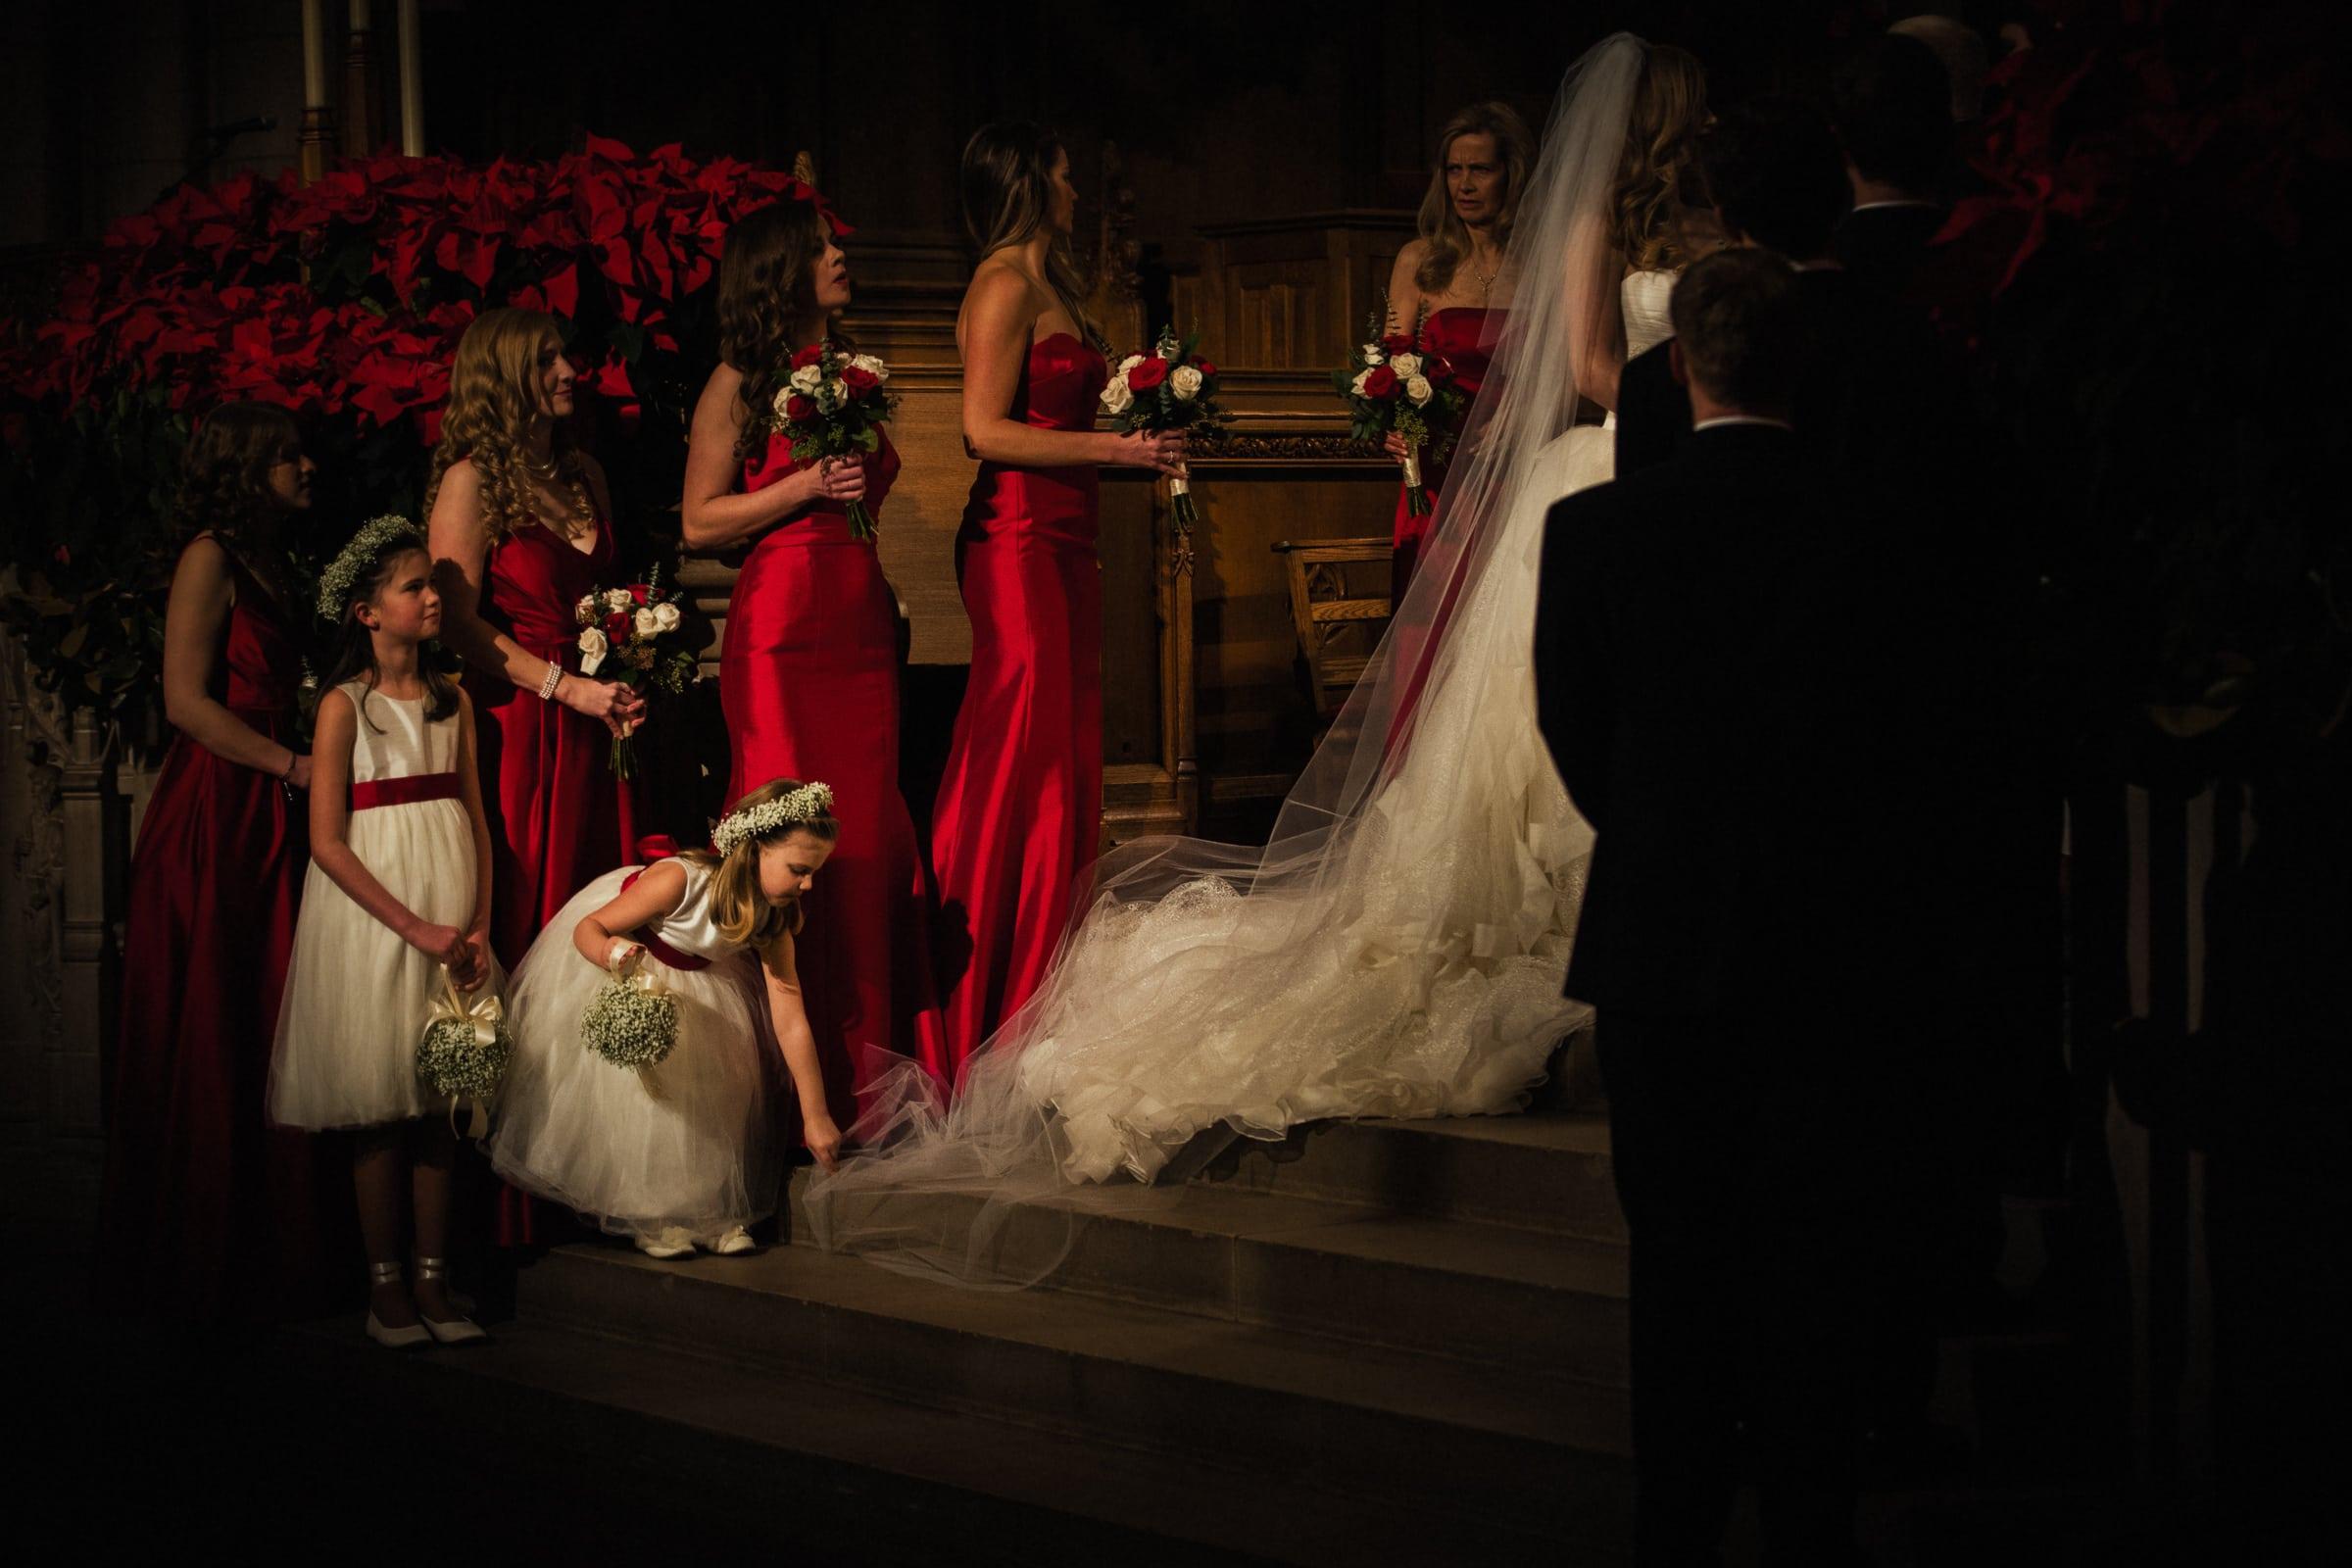 Duke Chapel Wedding Photo - Flower Girl Fixes Dress